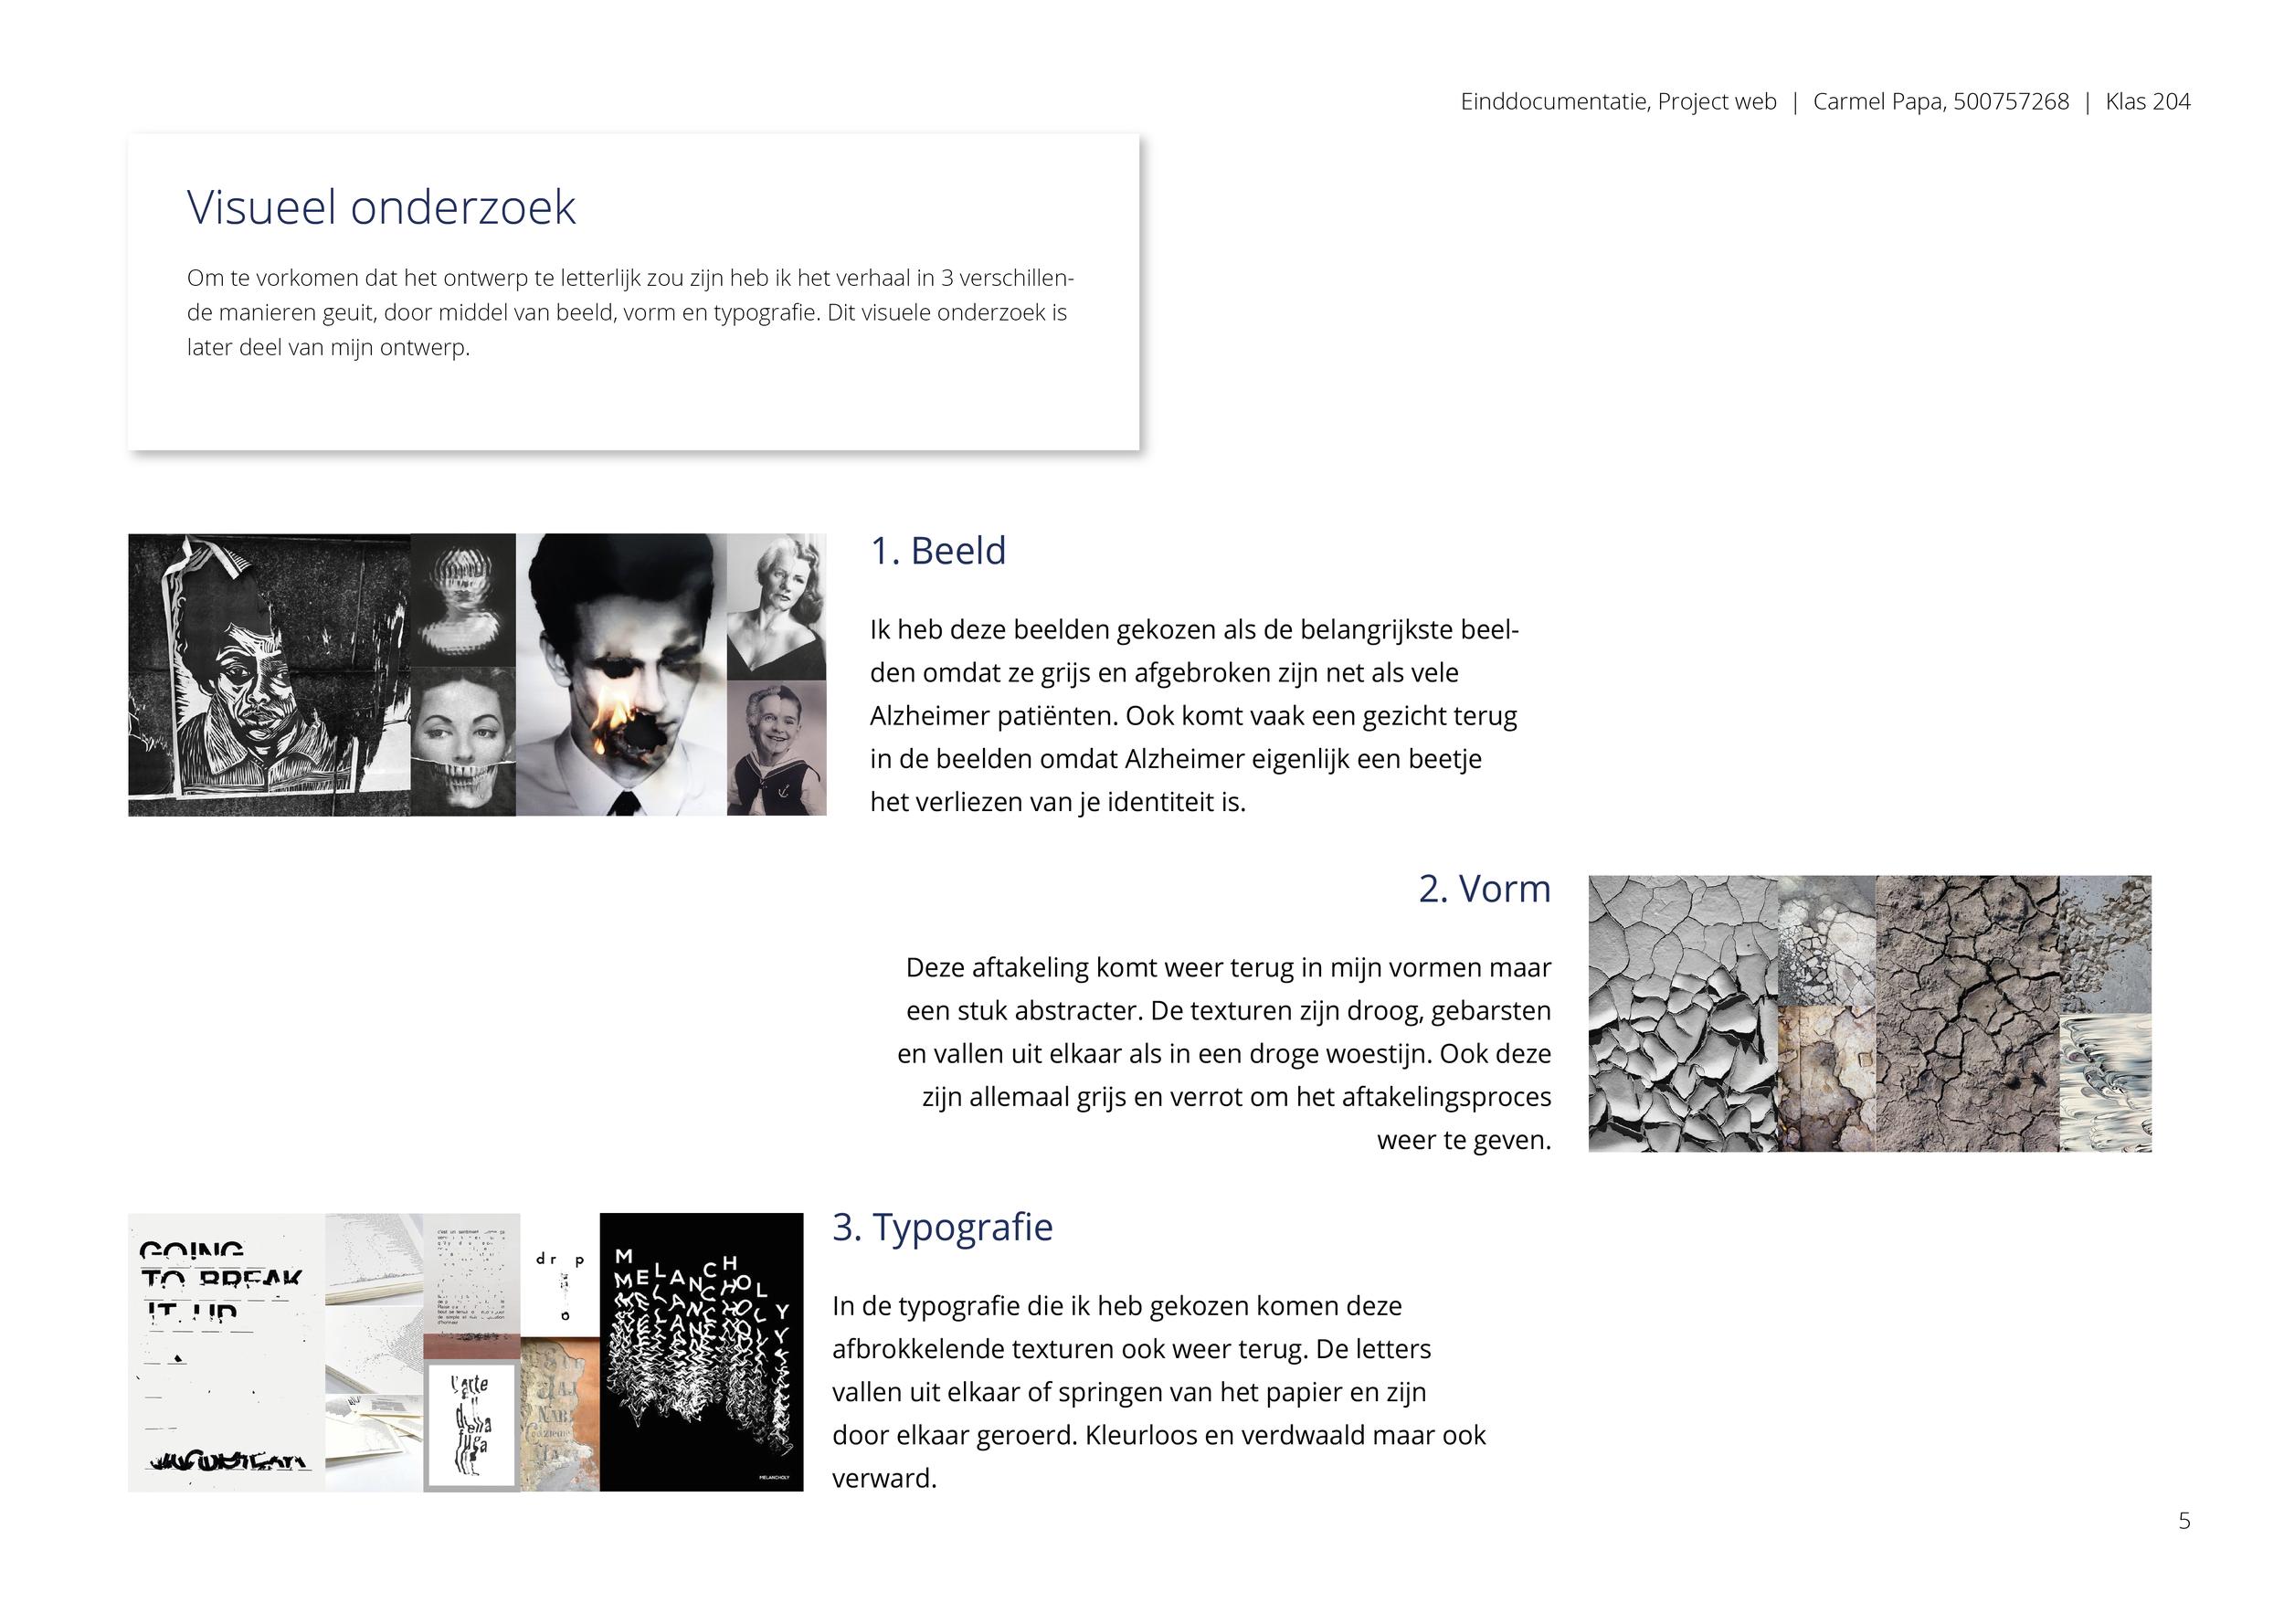 Einddocument_Project Web_Carmel Papa_204_Visueel onderzoek.png